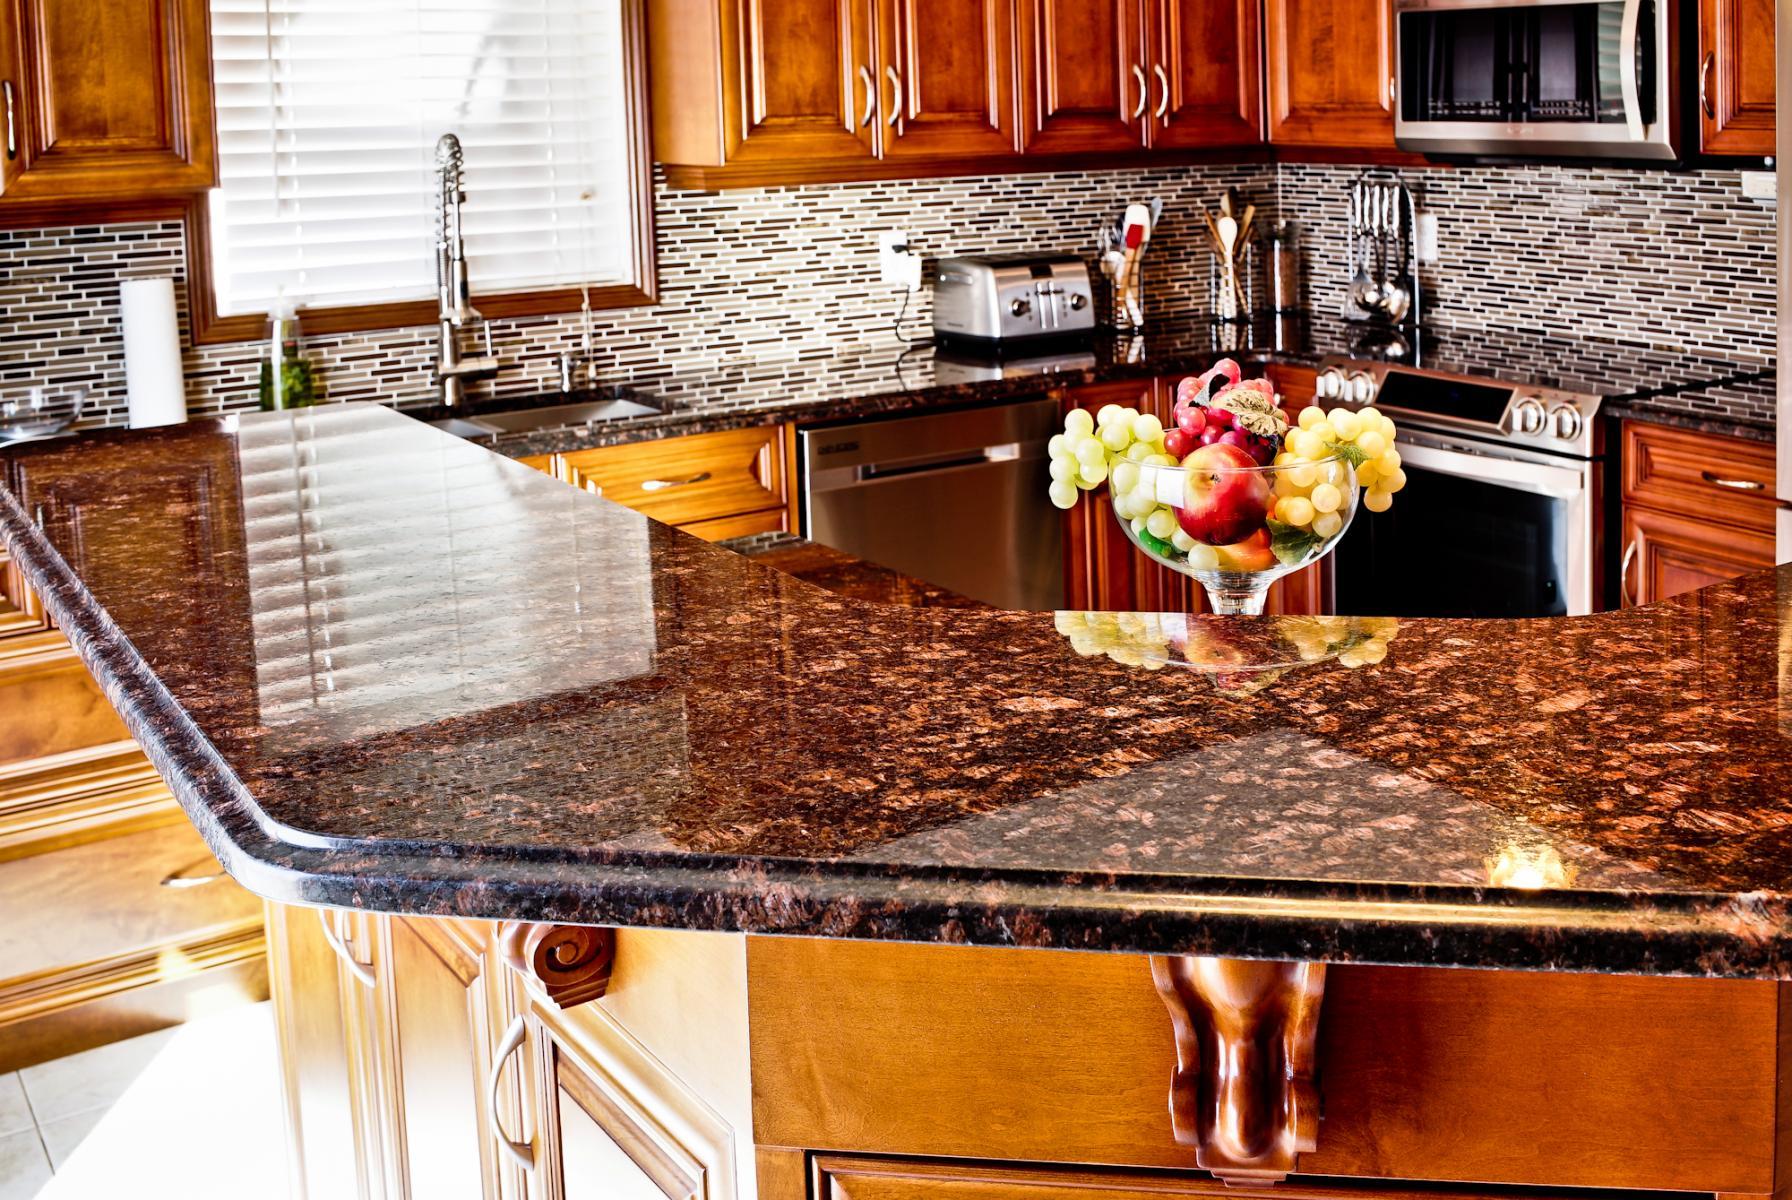 countertops granite design backsplash ideas tan of for countertop kitchen luxury brown